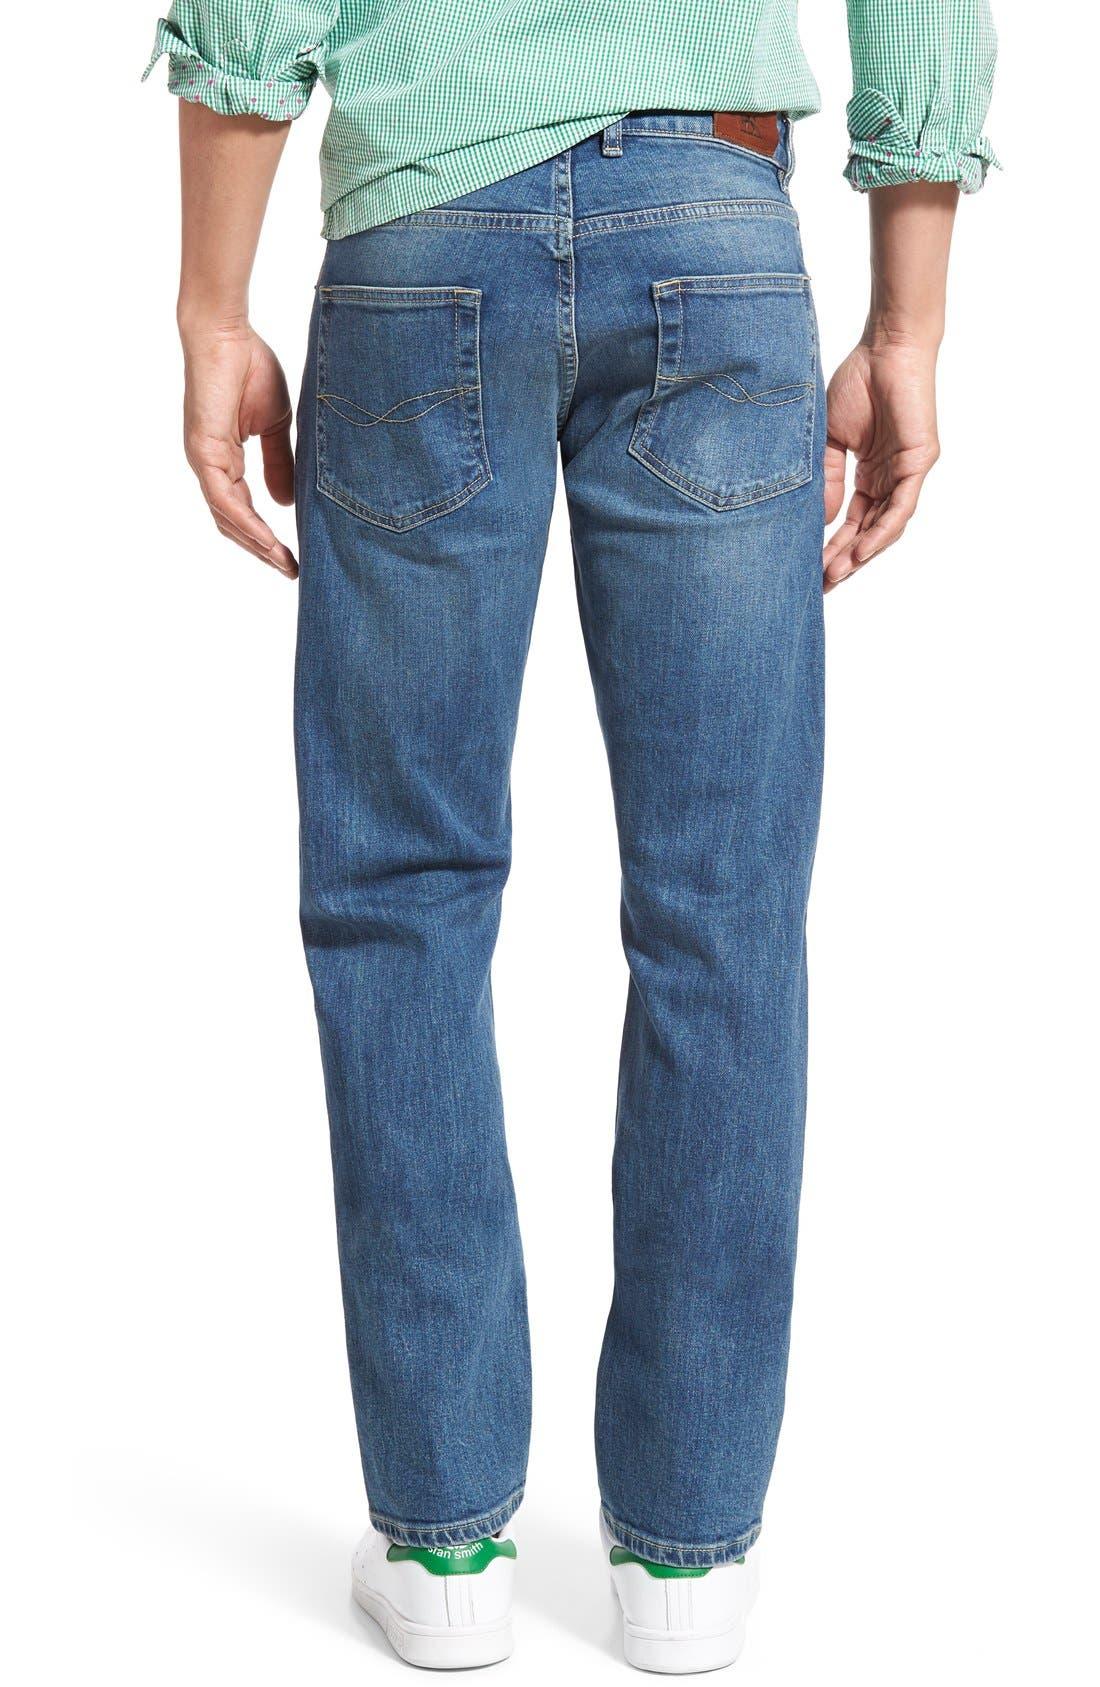 'Nicholls' Regular Fit Straight Leg Jeans,                             Alternate thumbnail 2, color,                             DENIM